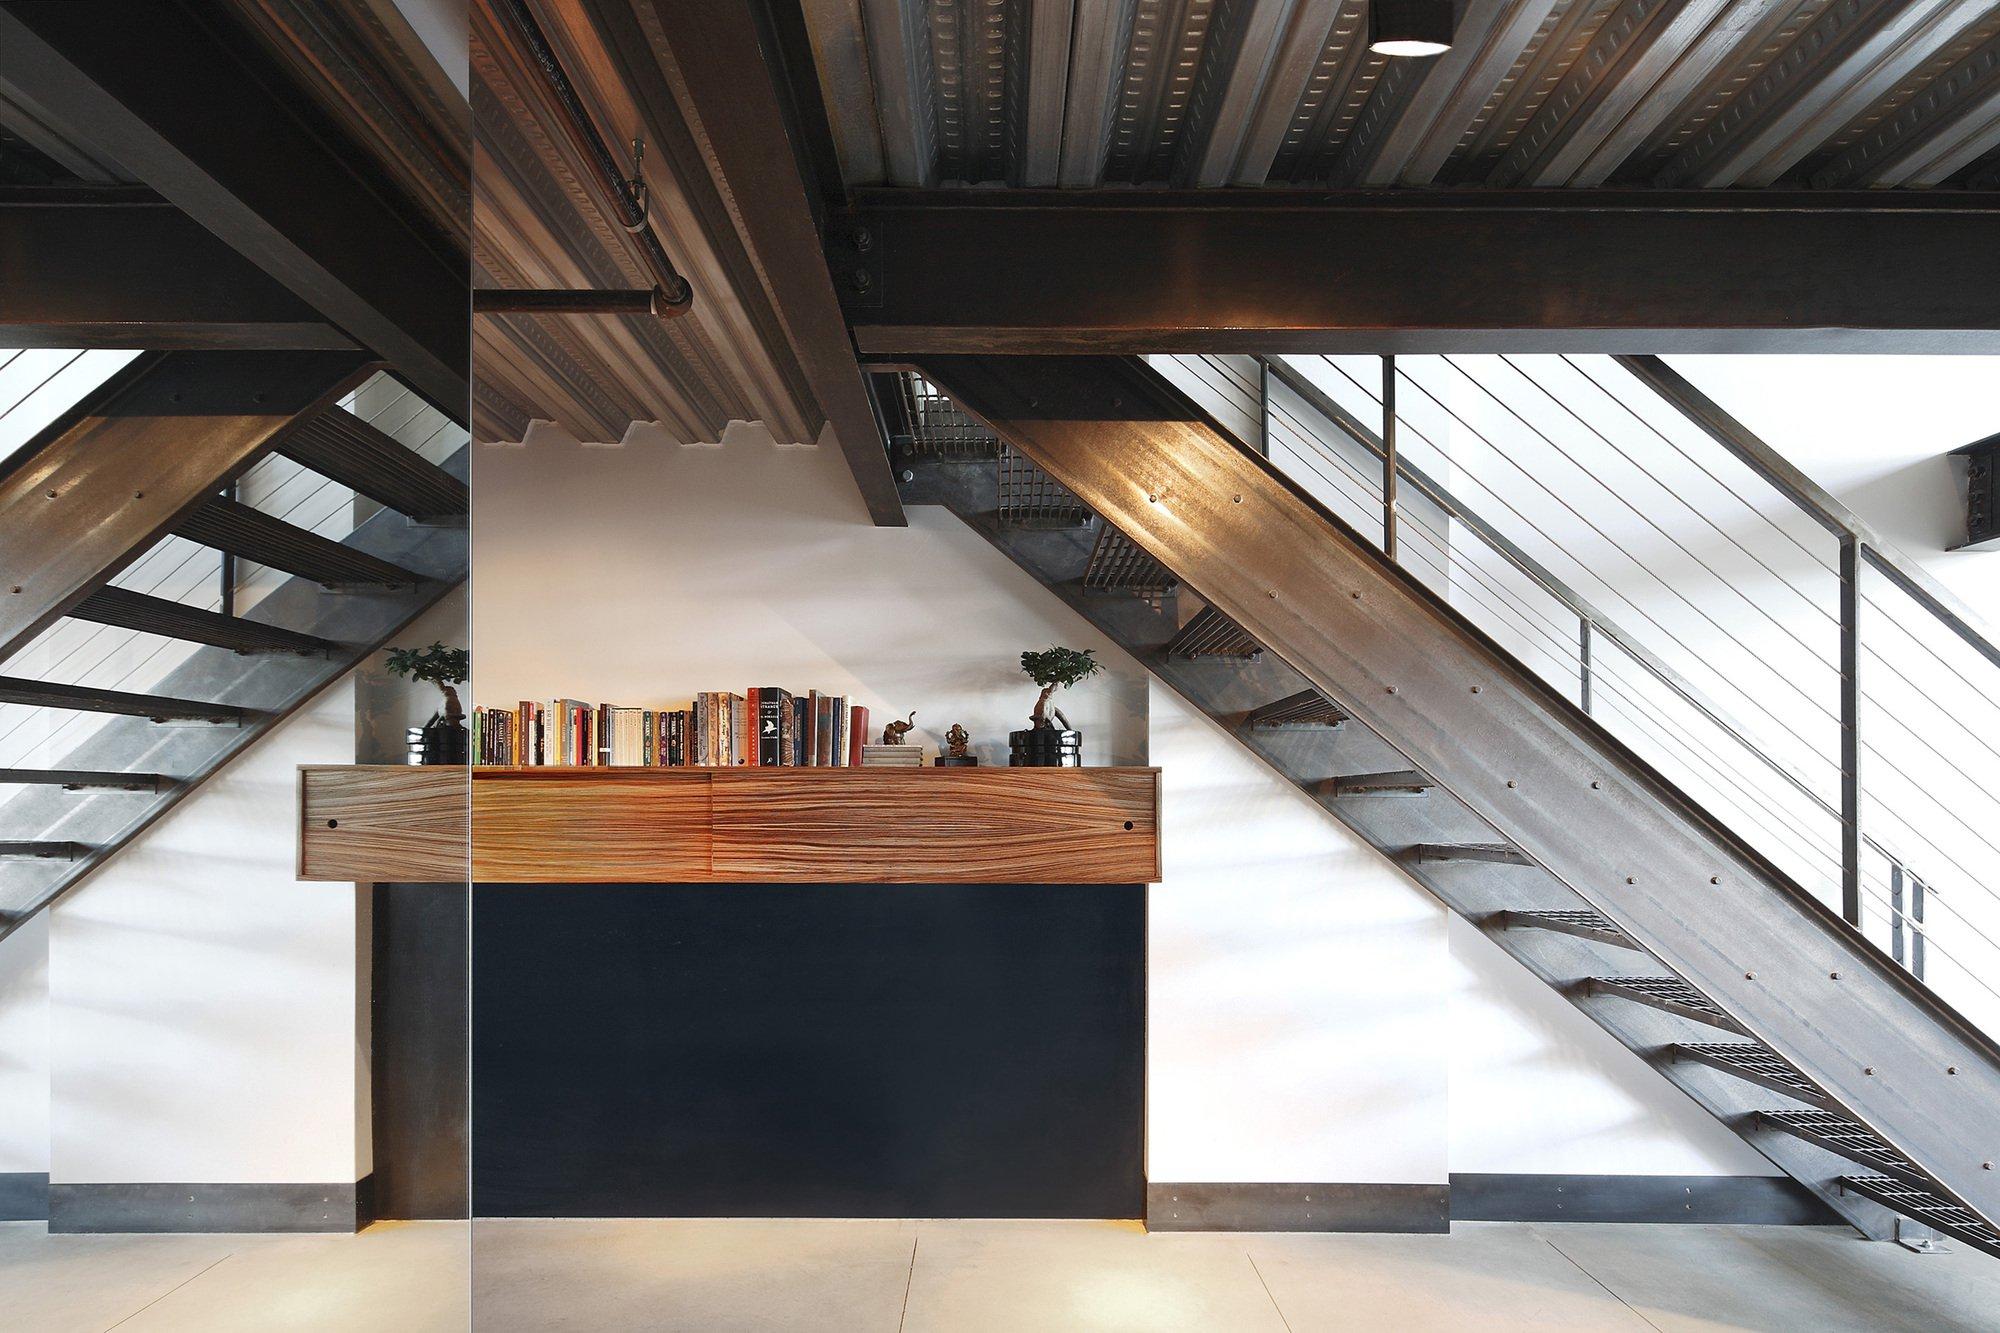 54ed12cee58ece5dcd000042_capitol-hill-loft-shed-architecture-design_capitol_hill_loft_stair.jpg